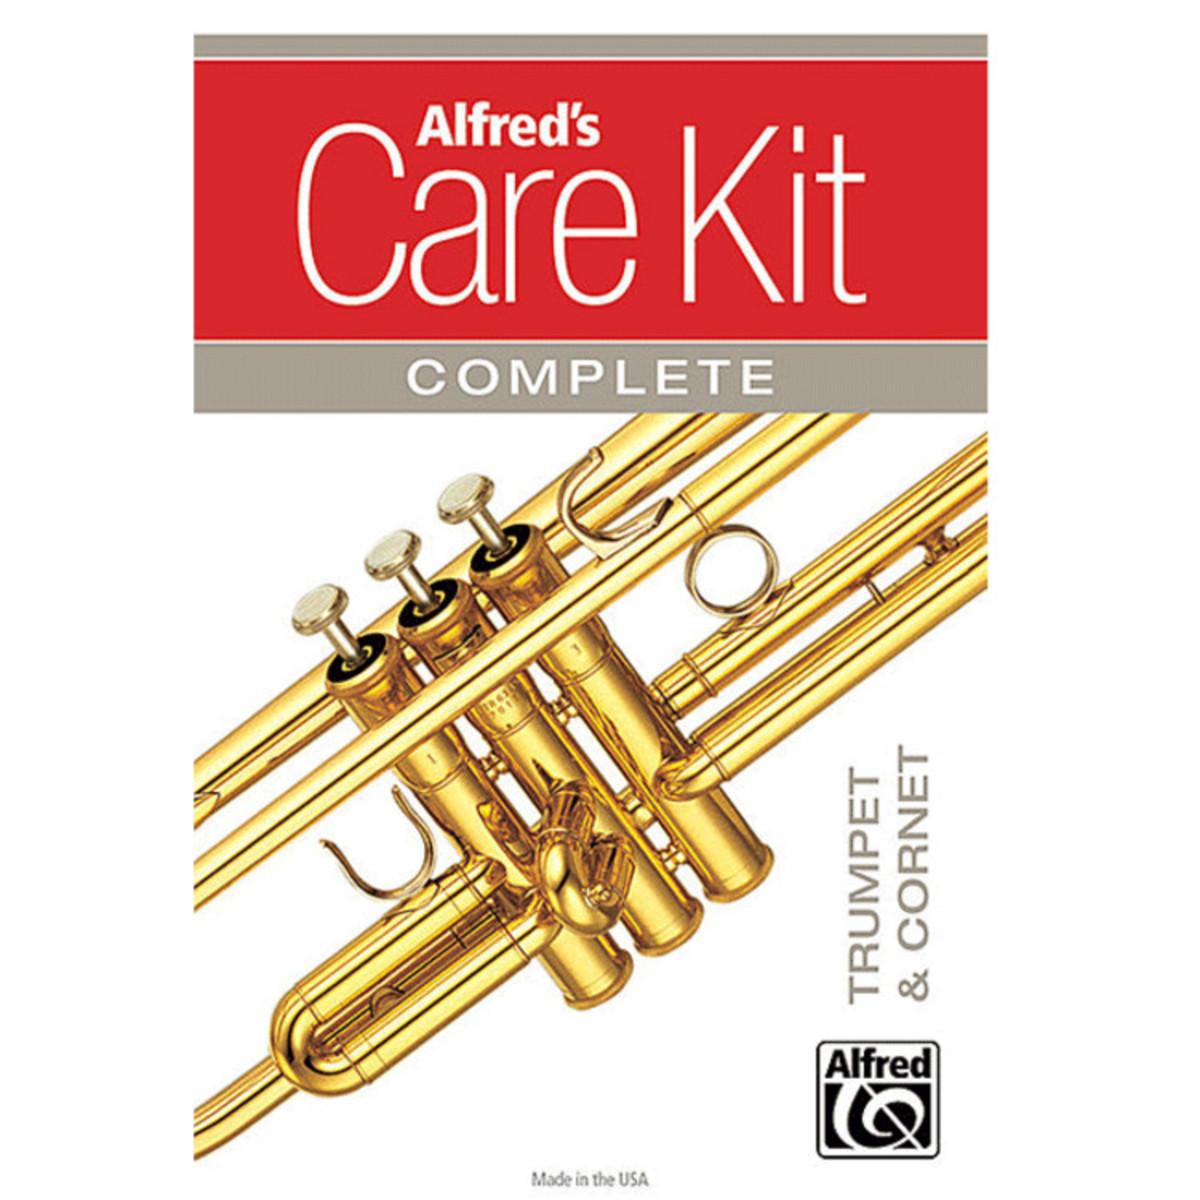 Image of Alfreds Complete Trumpet/Cornet Care Kit